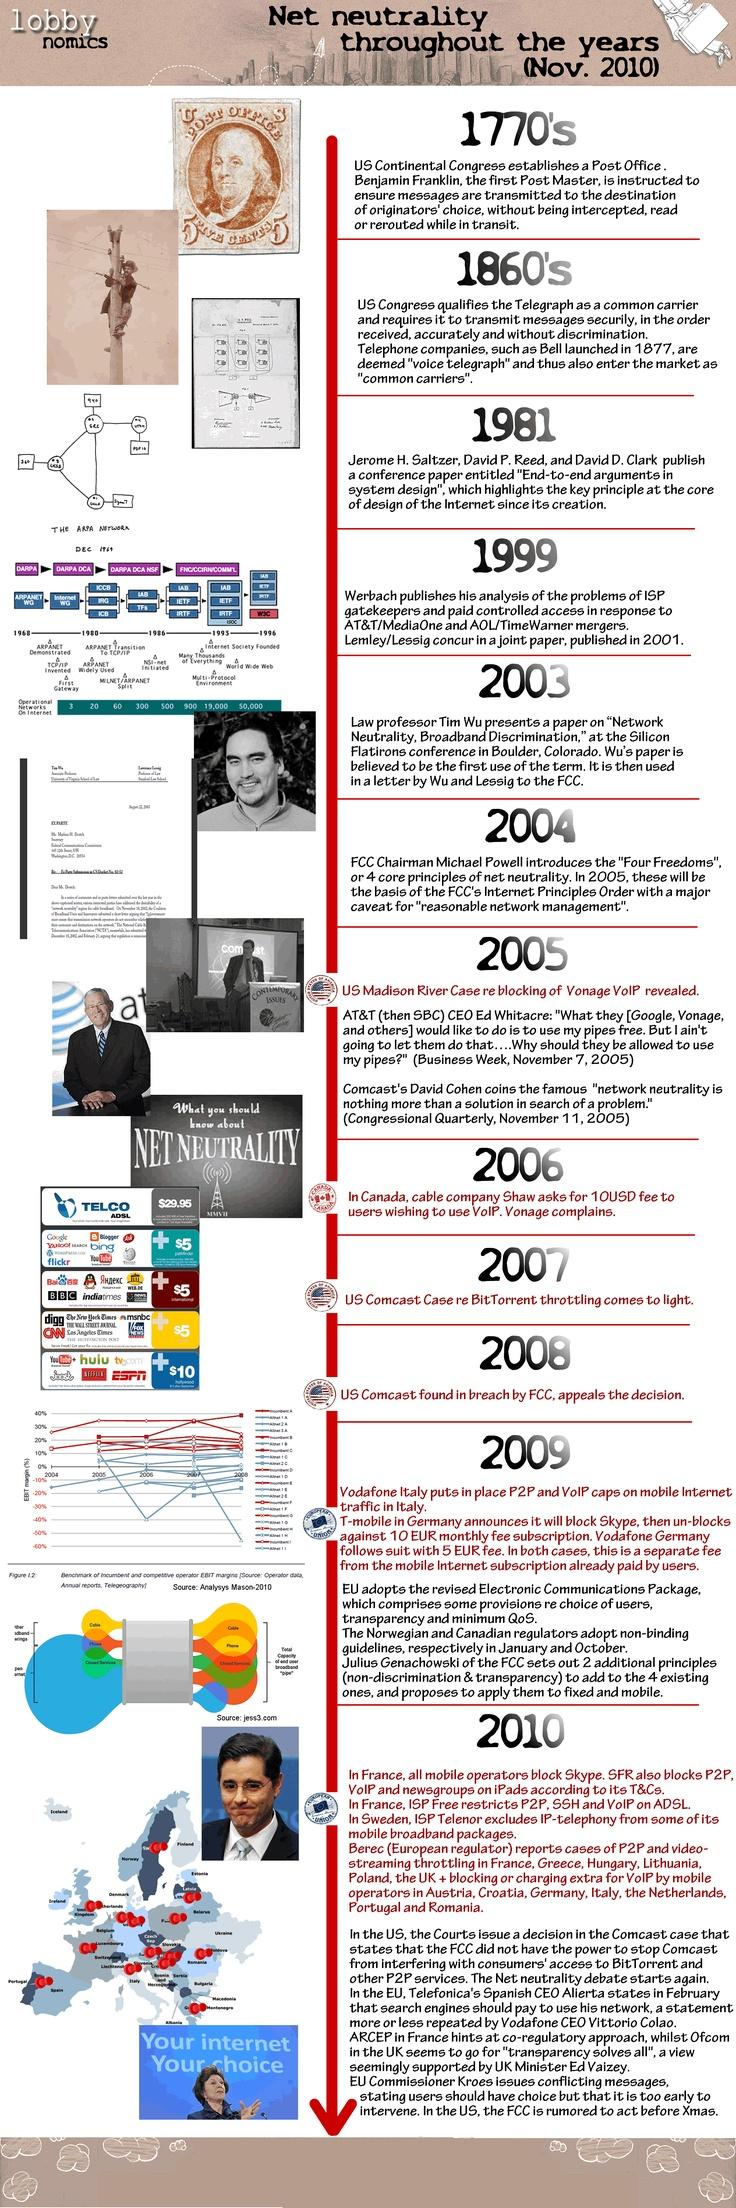 net neutrality timeline